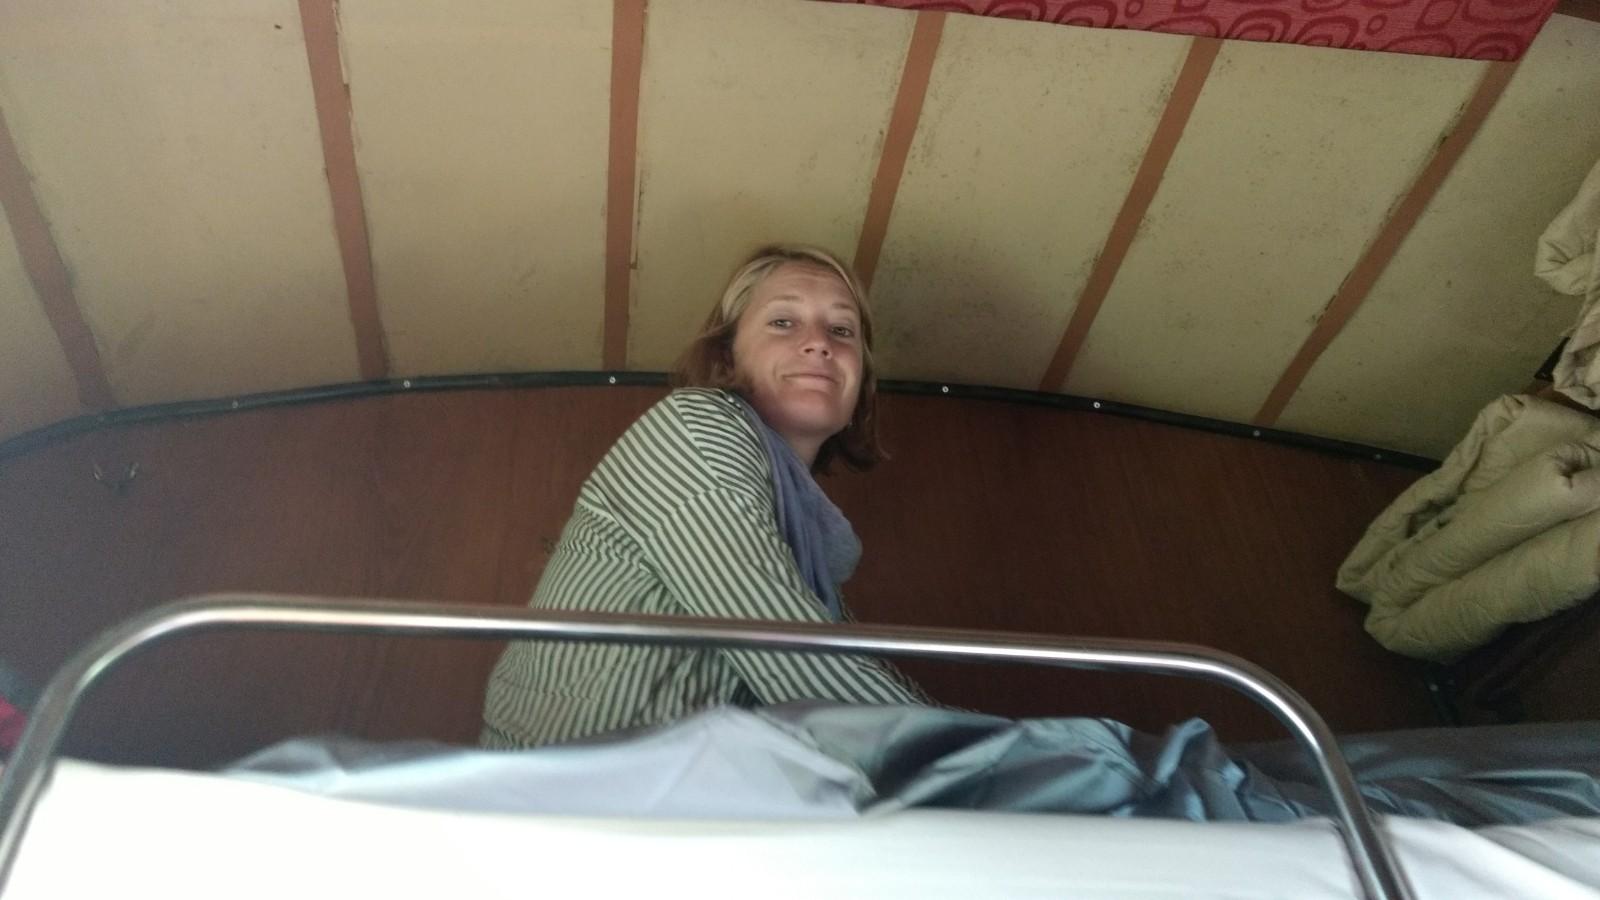 In the four berth sleeper car.